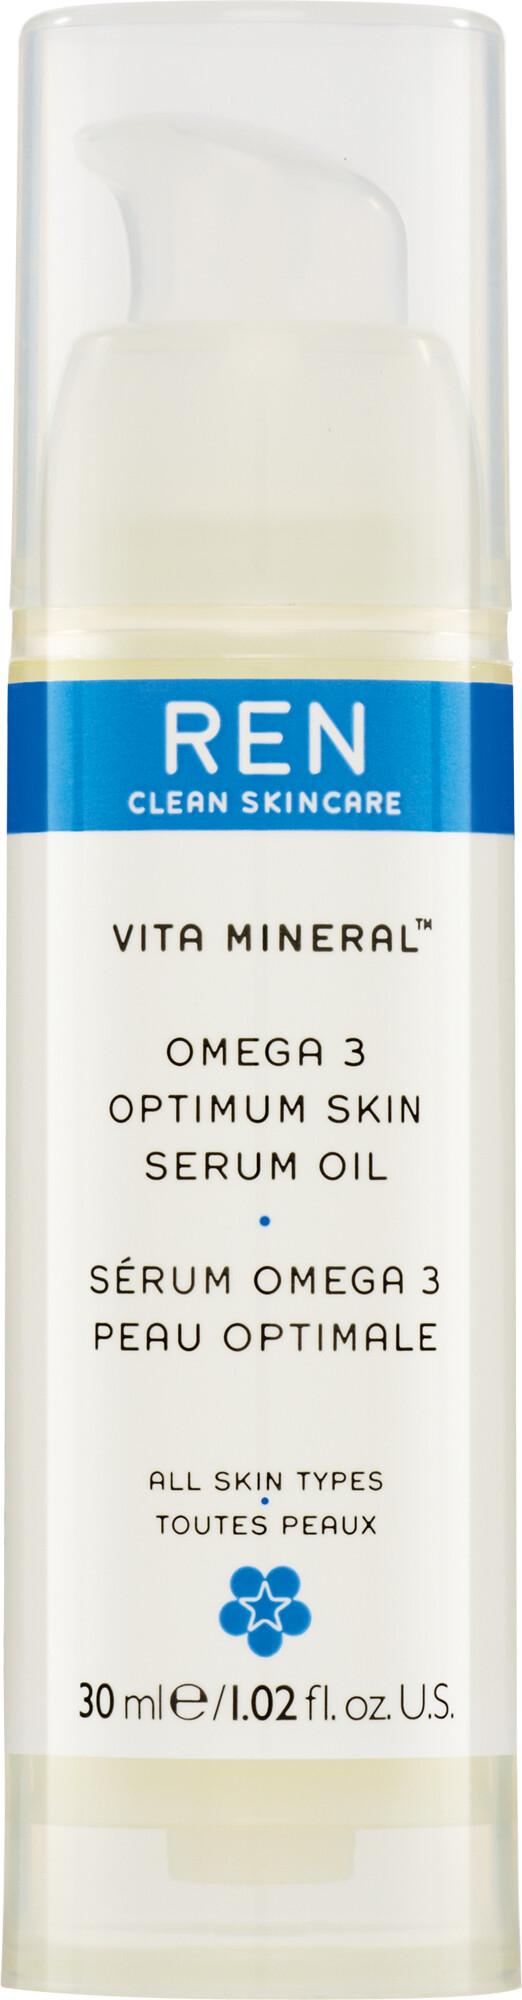 Omega 3 facial serum ren